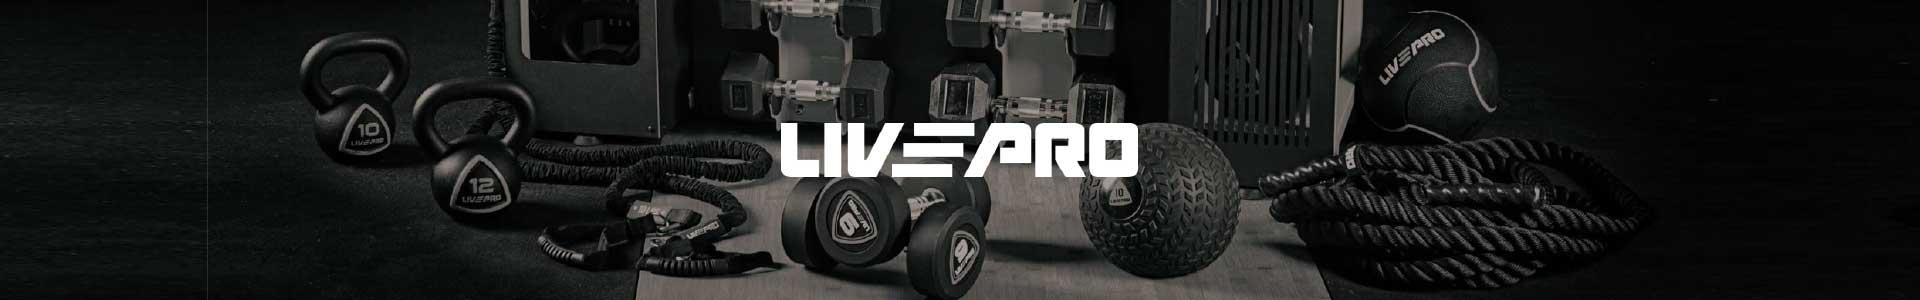 Budopunkt – Livepro Fitness